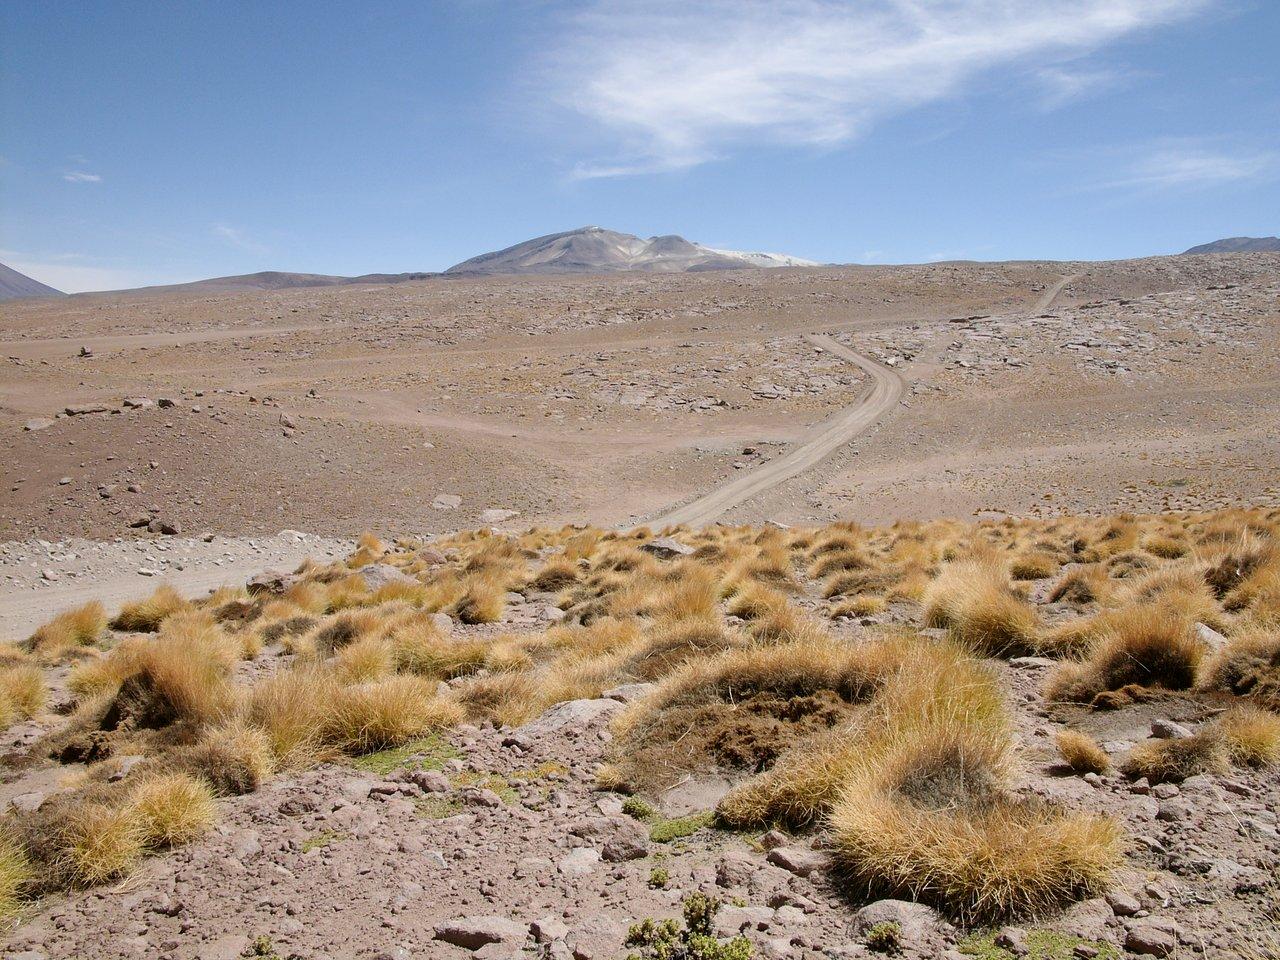 High Altitude Plants